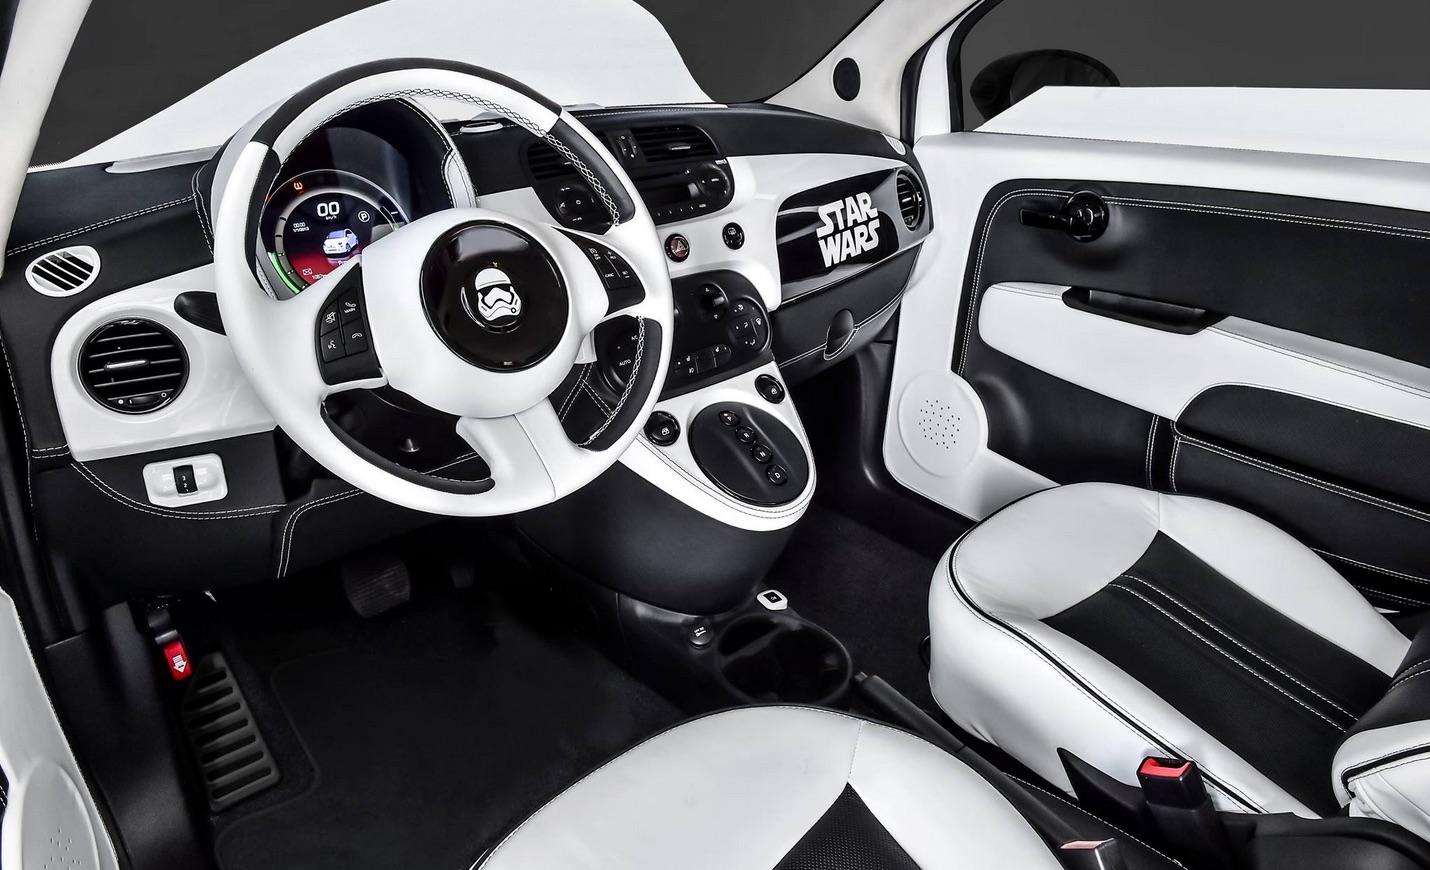 Une Fiat 500 en hommage à la saga Star Wars fiat-500-star-wars-3